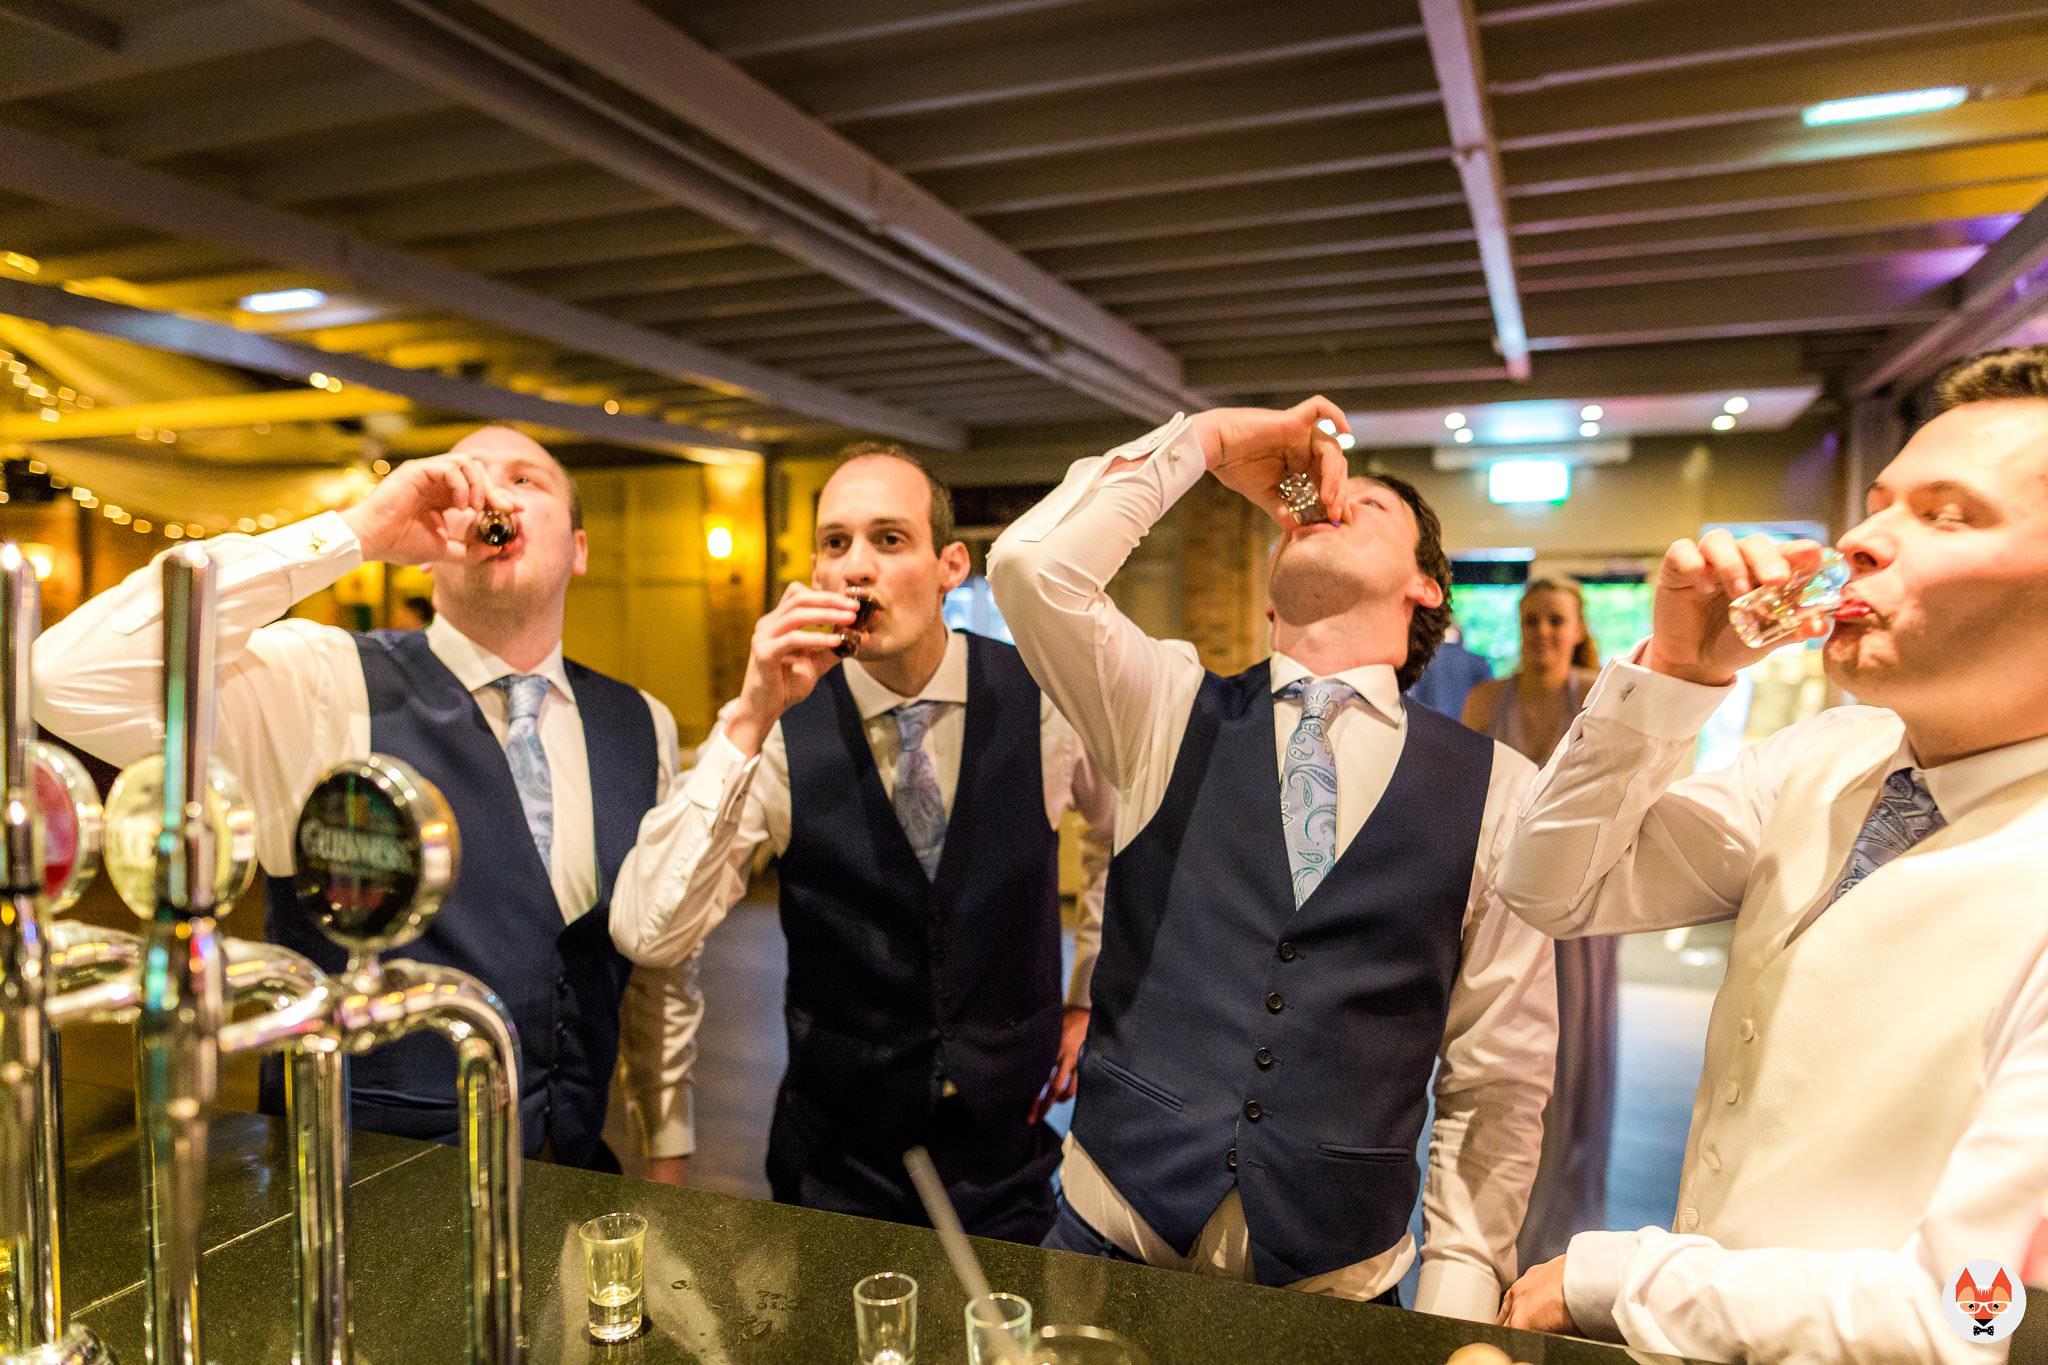 groomsmen doing shots at bar